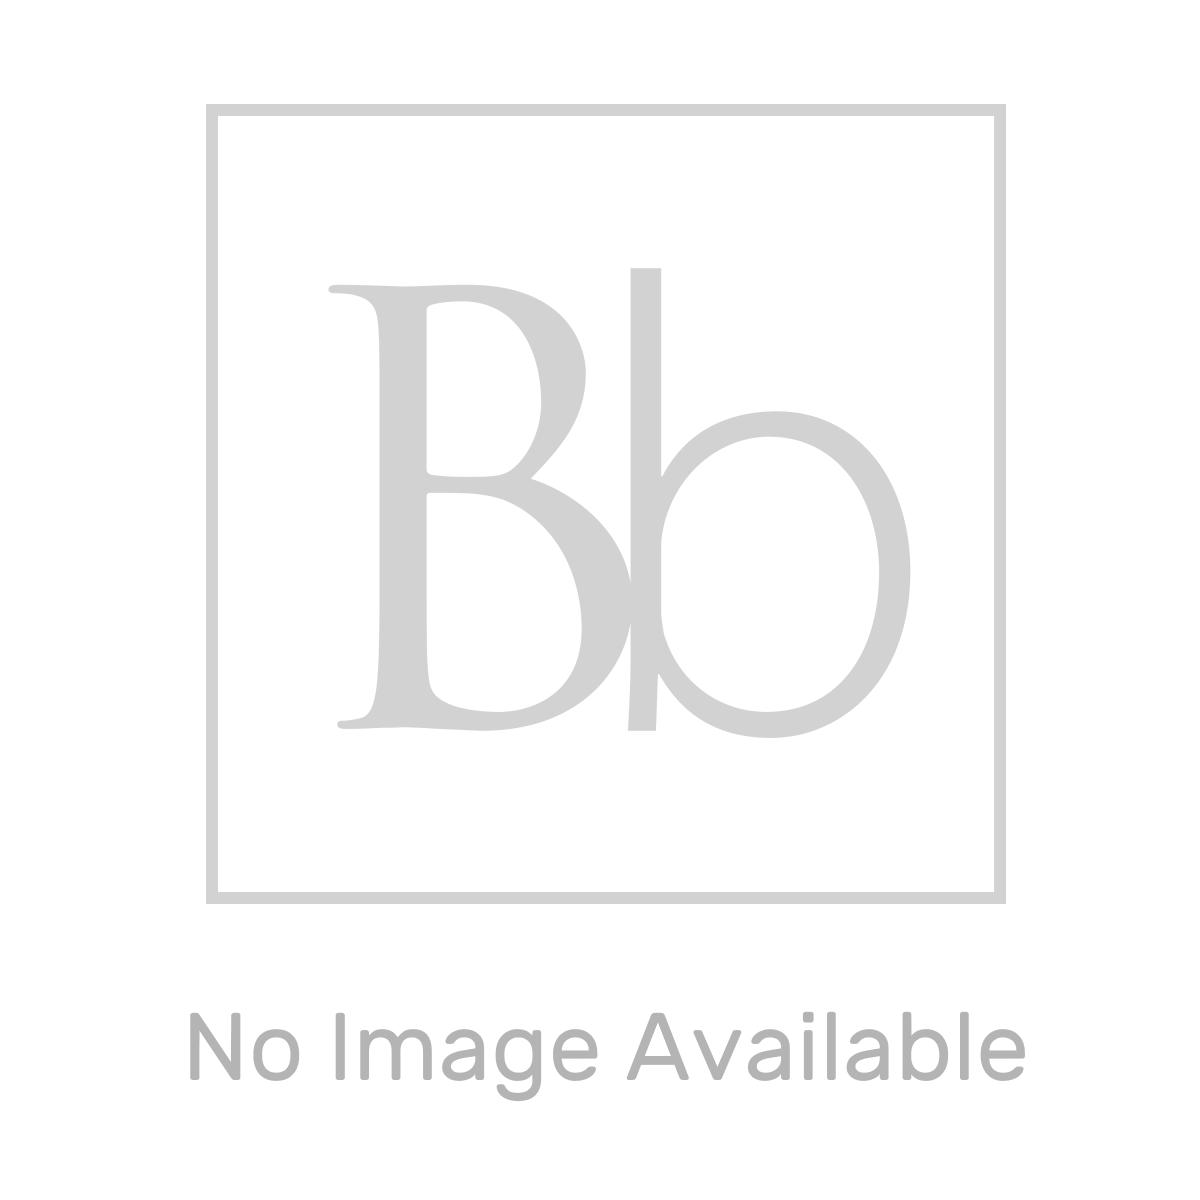 RAK Athens Chrome Dual Handle Kitchen Sink Mixer Tap